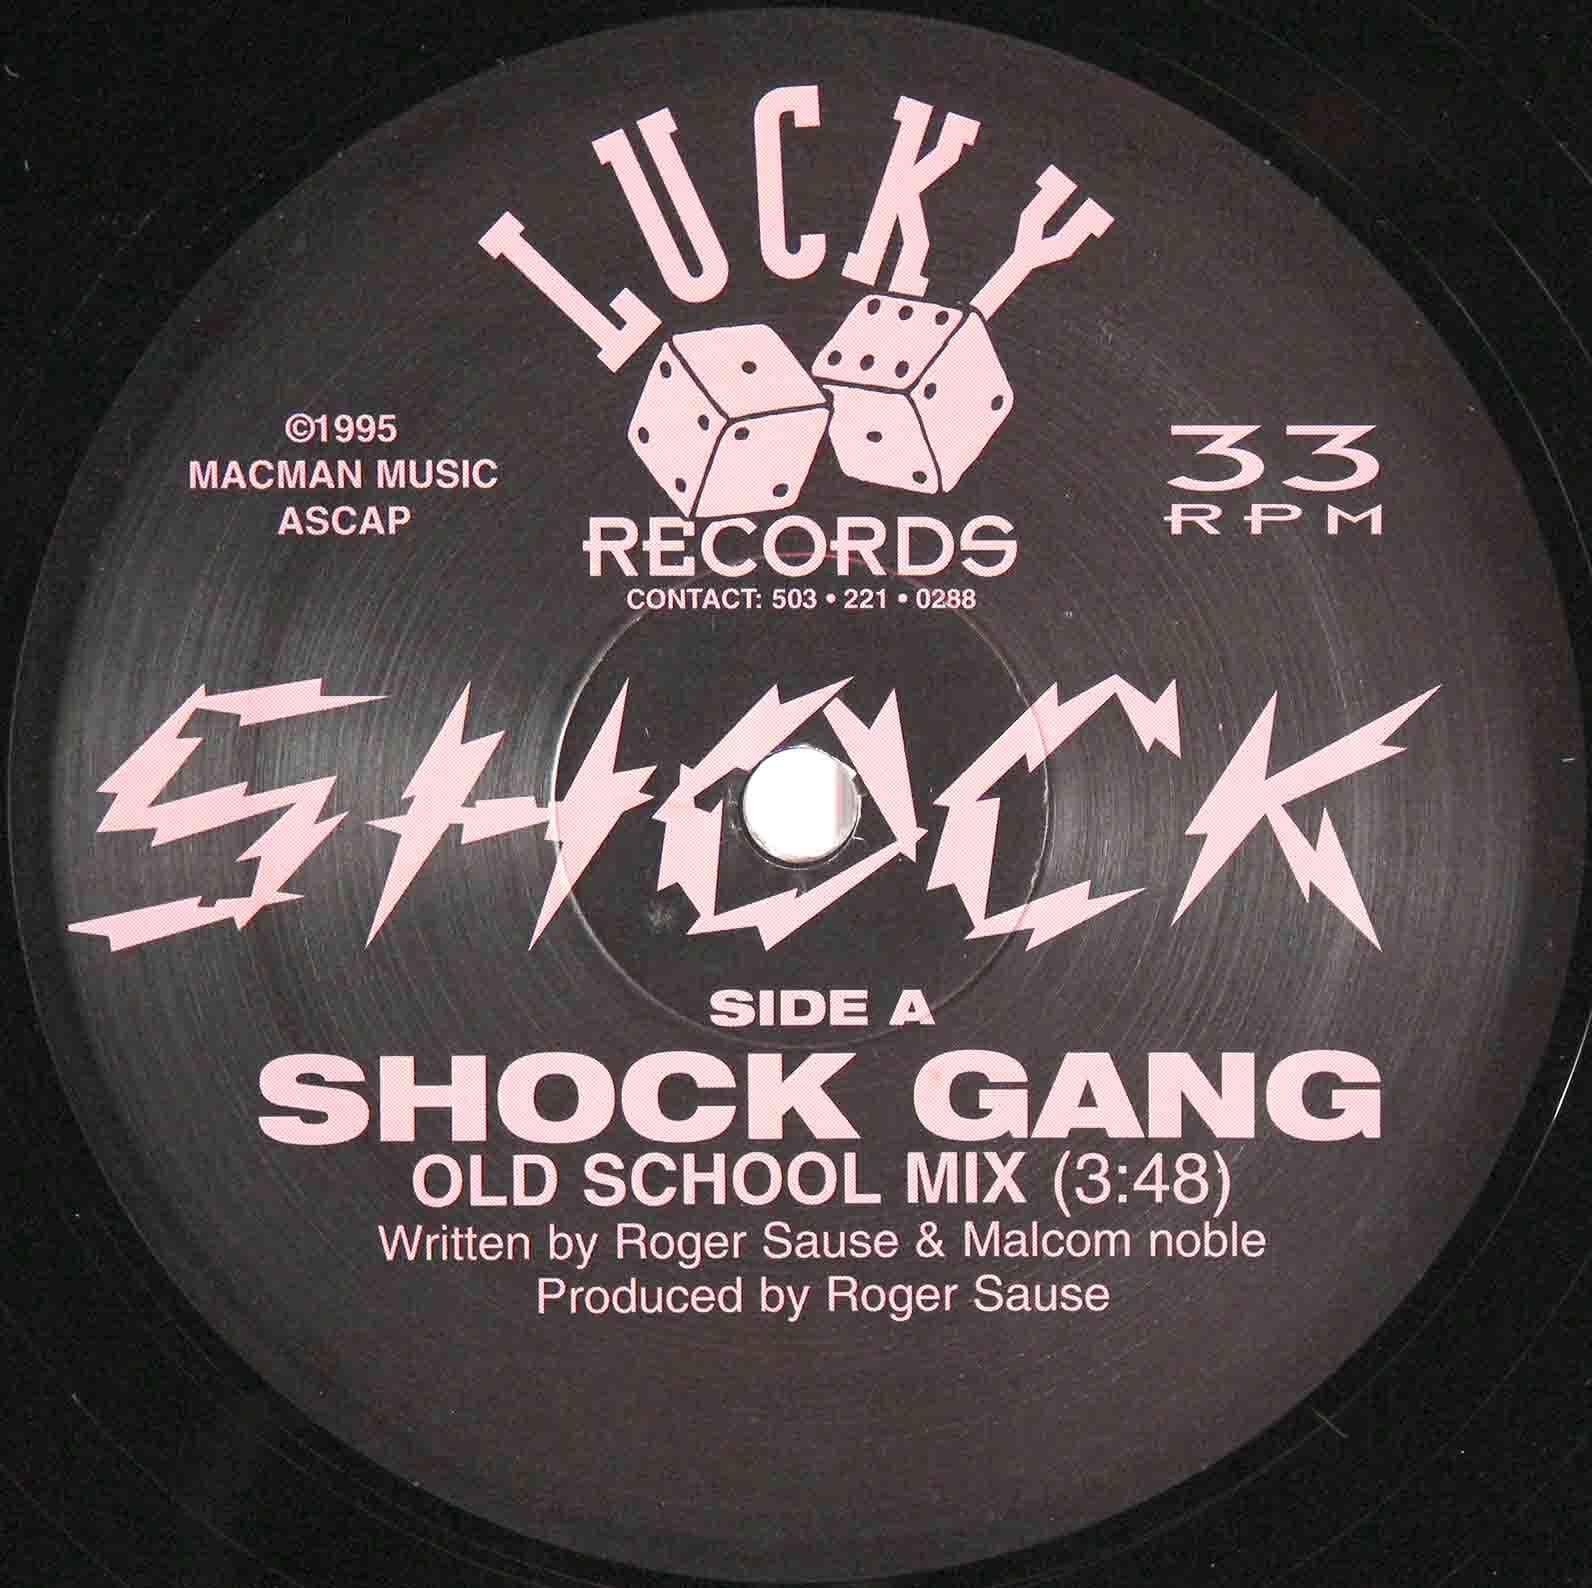 Shock - Shock Gang 03